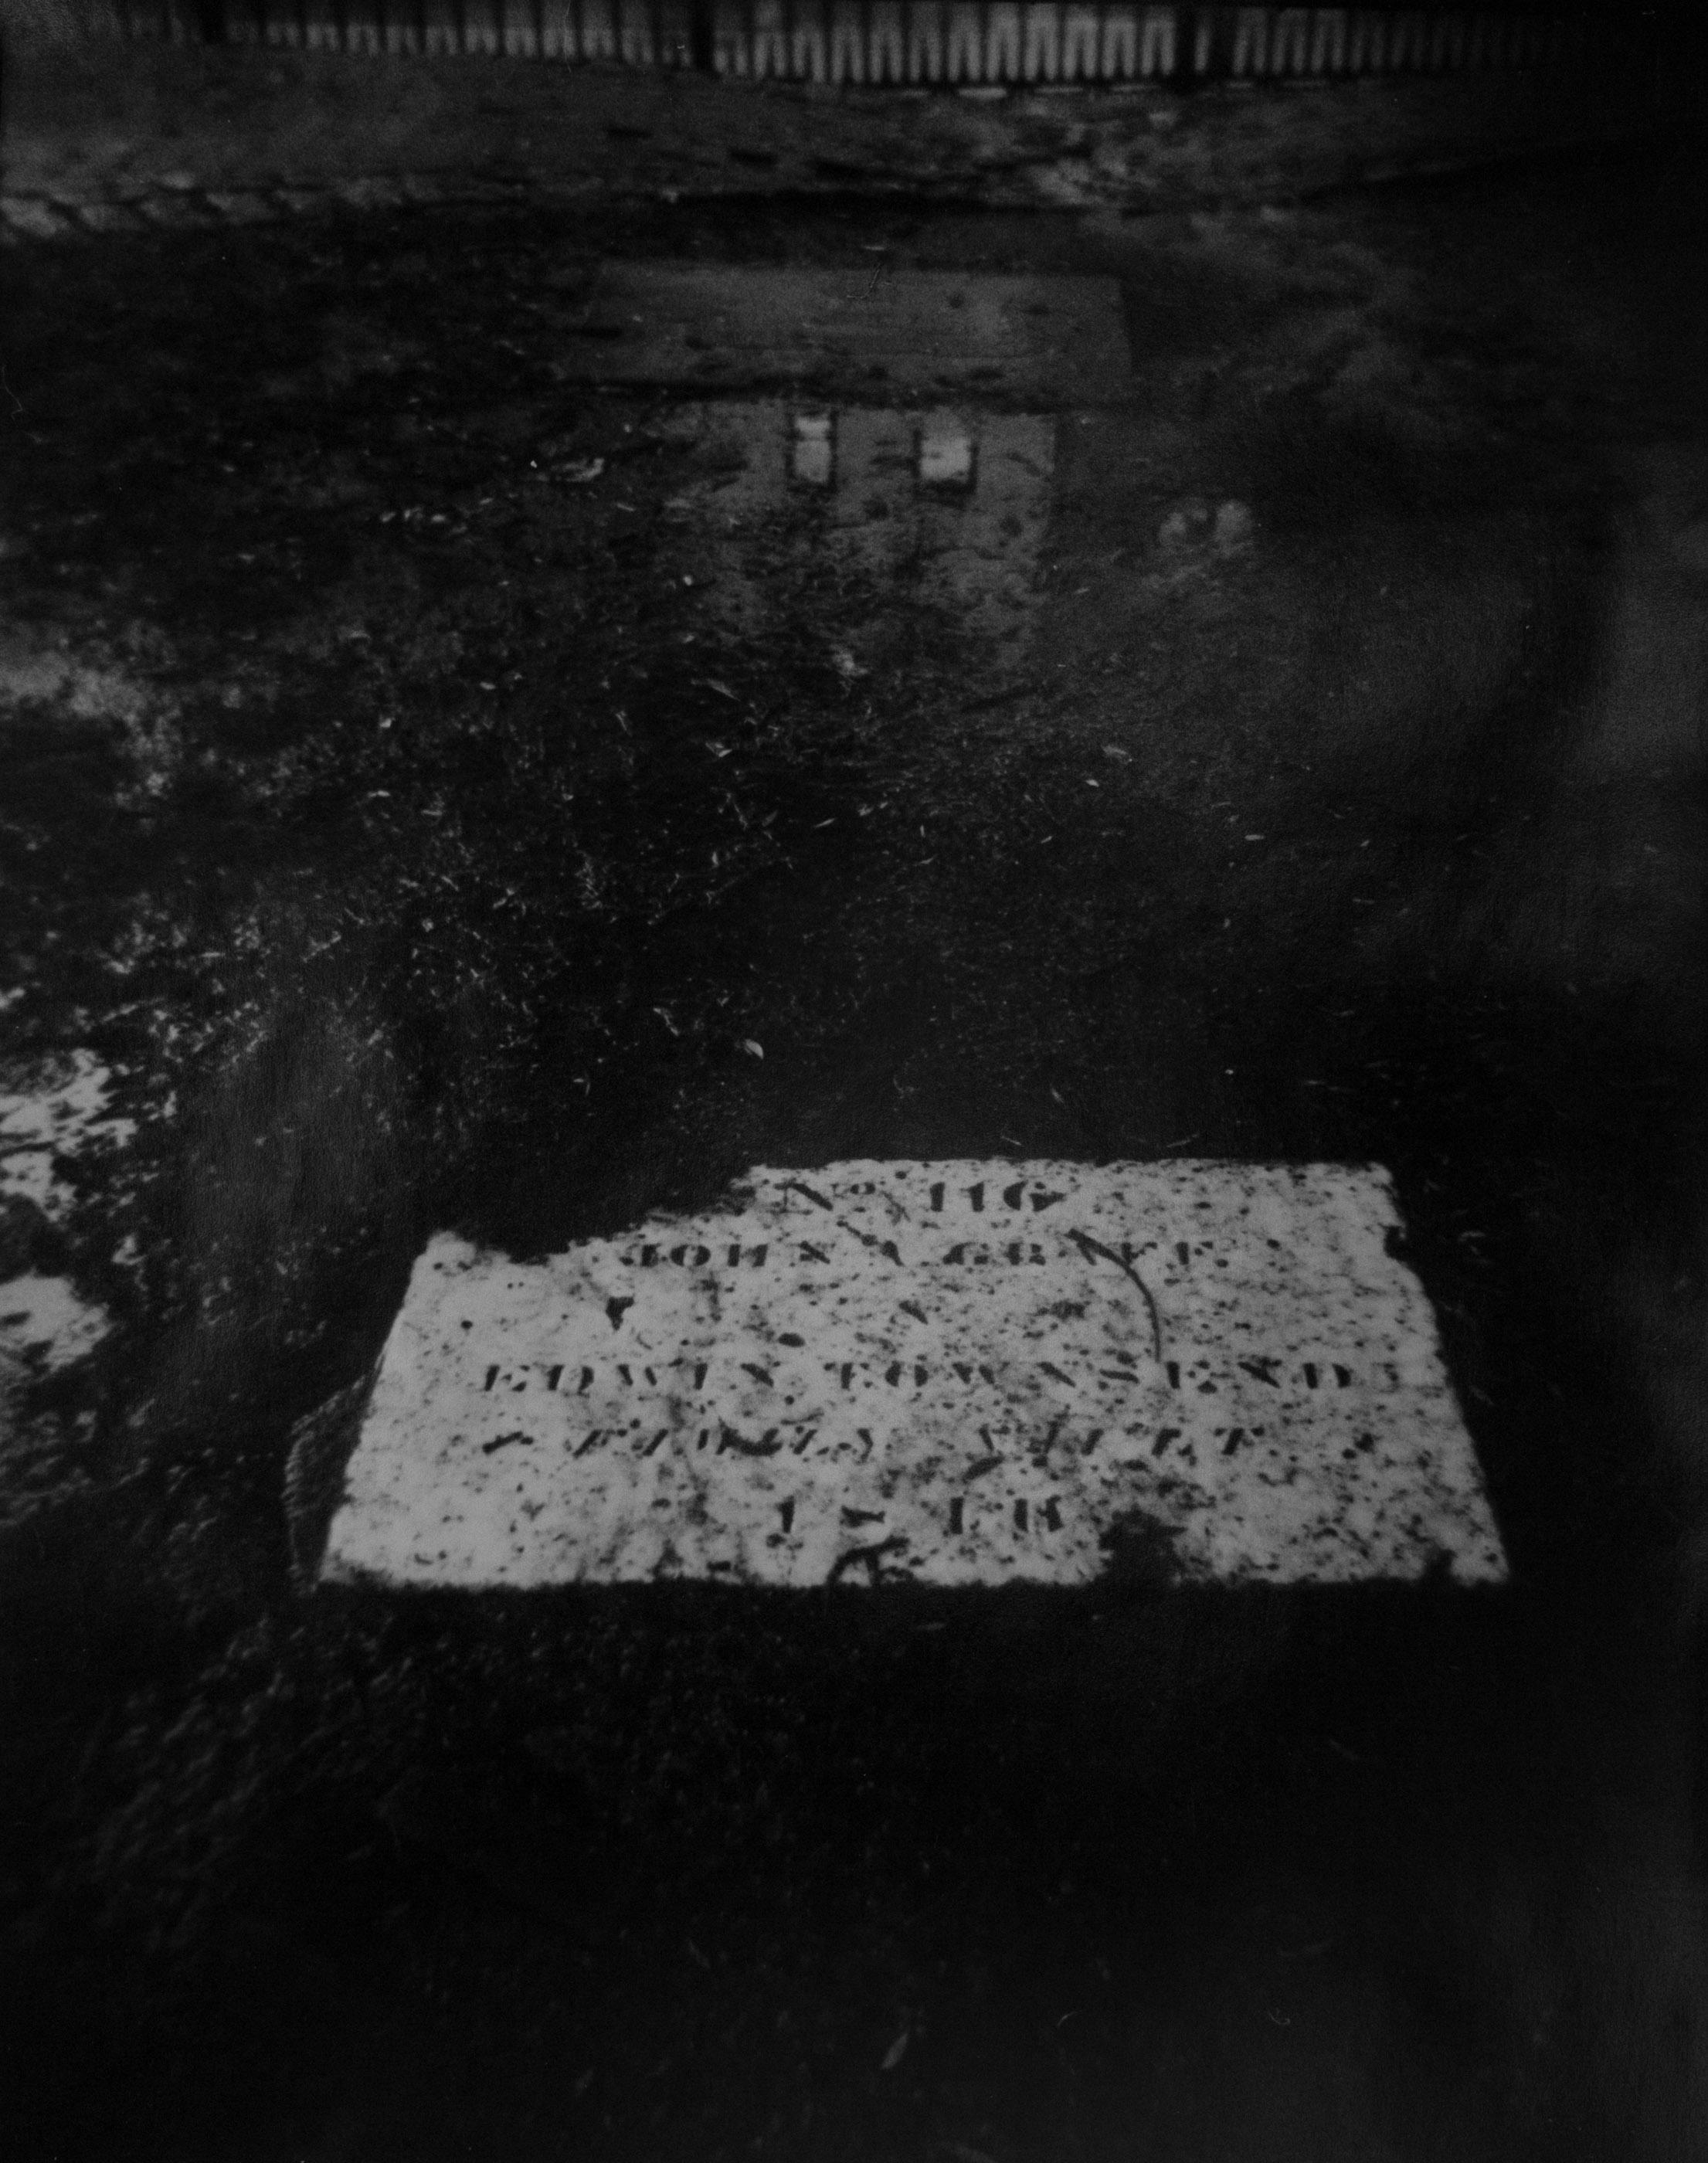 15_Grave Ground_St. Mark's Church-in-the-Bowerie, 1999-2000_.jpg